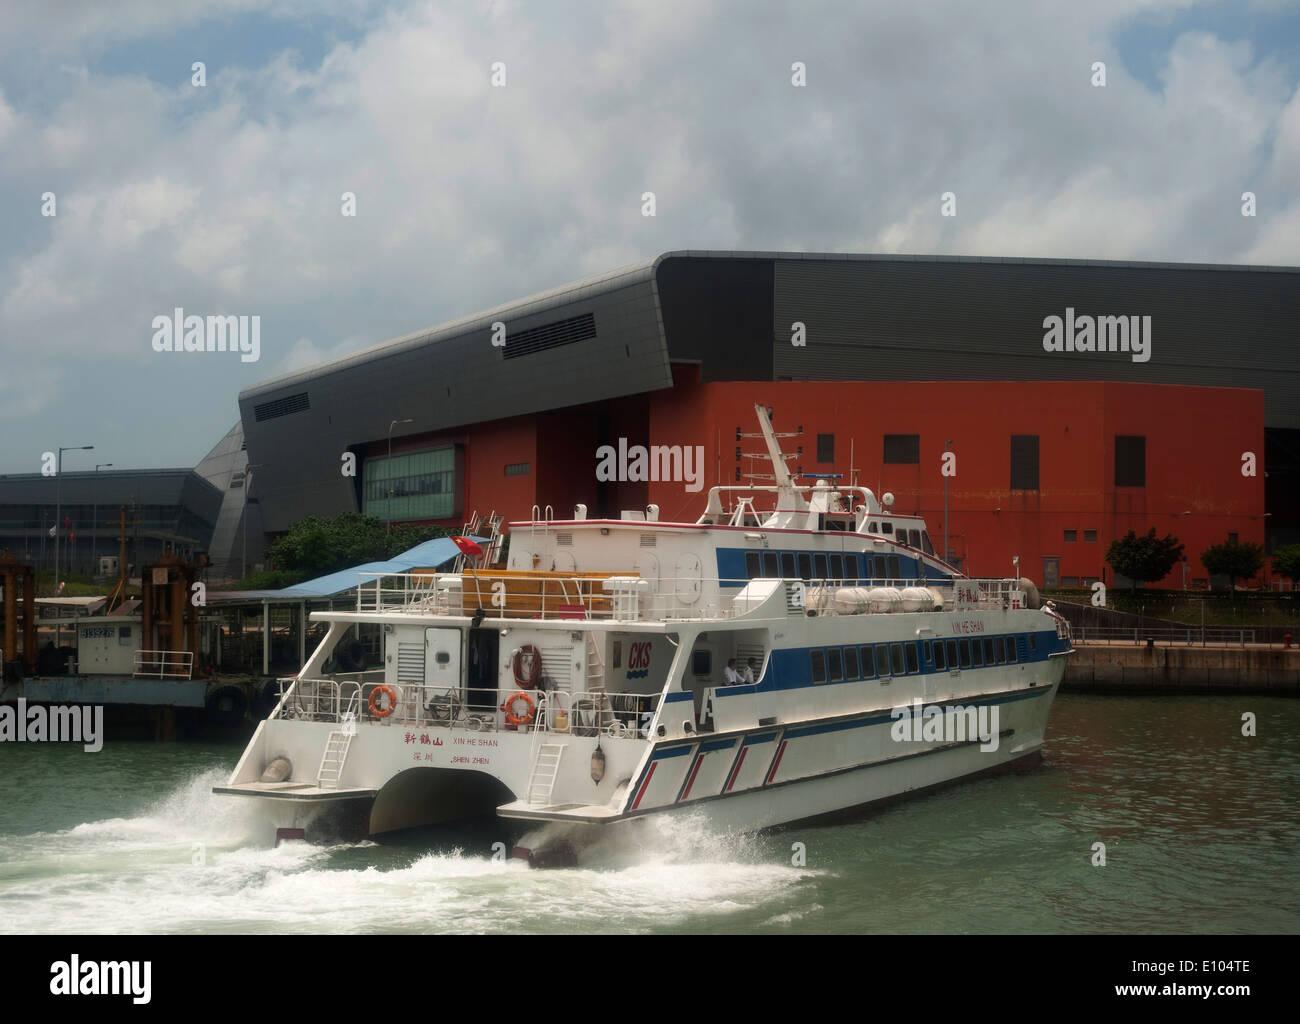 Chinese mainland & Macau ferries dock at Hong Kong International Airport, Chek Lap Kok island, Hong Kong, China, South East Asia - Stock Image